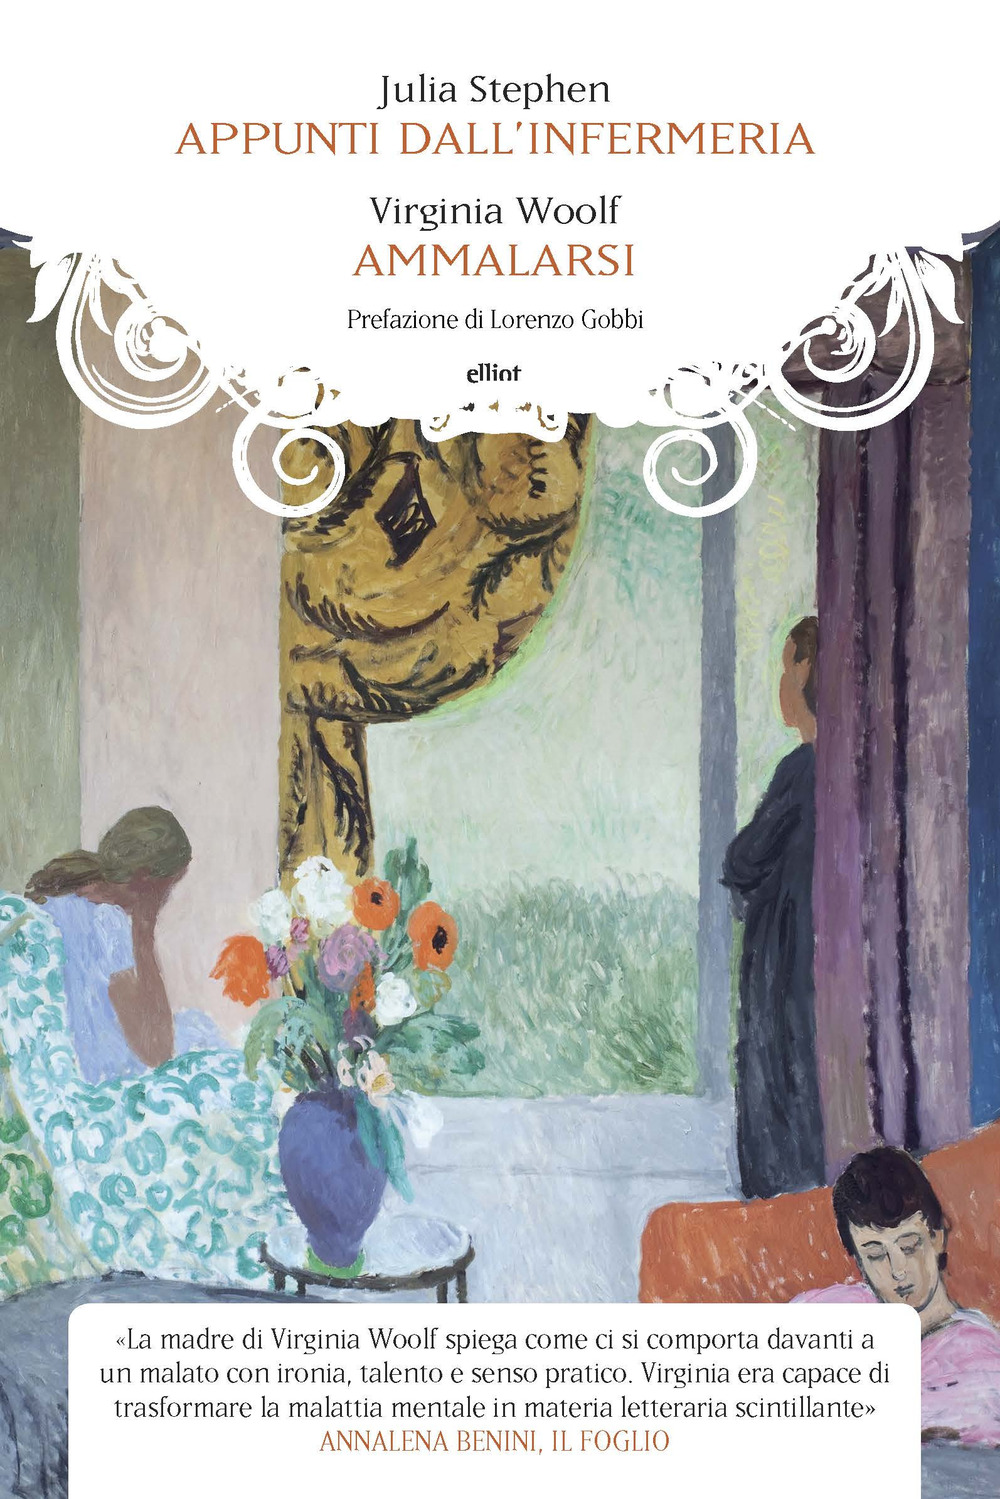 AMMALARSI-APPUNTI DALL'INFERMERIA - Woolf Virginia; Stephen Julia - 9788869939259